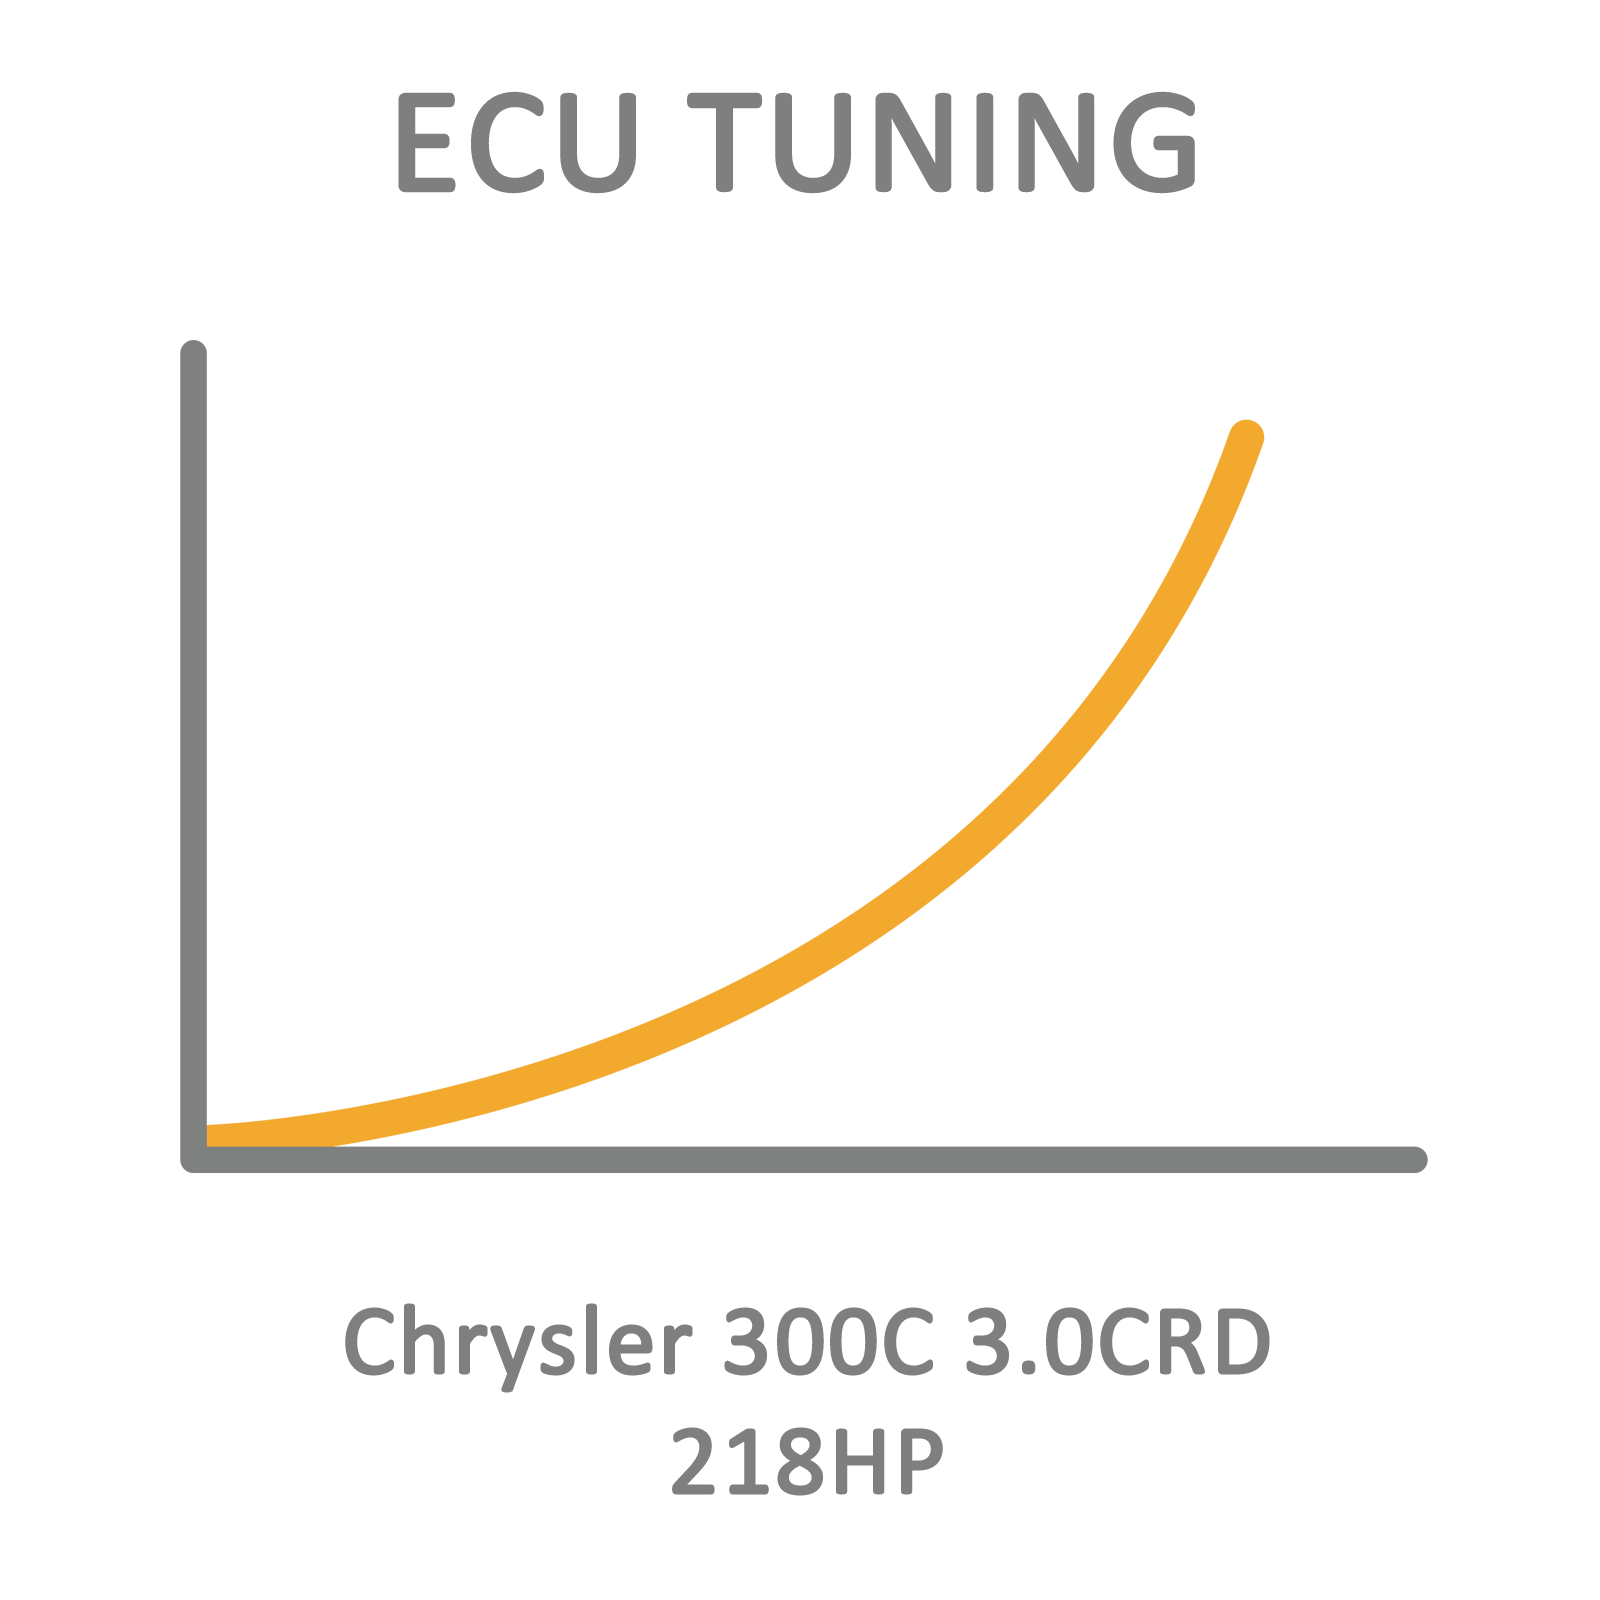 Chrysler 300C 3 0CRD 218HP ECU Tuning Remapping Programming